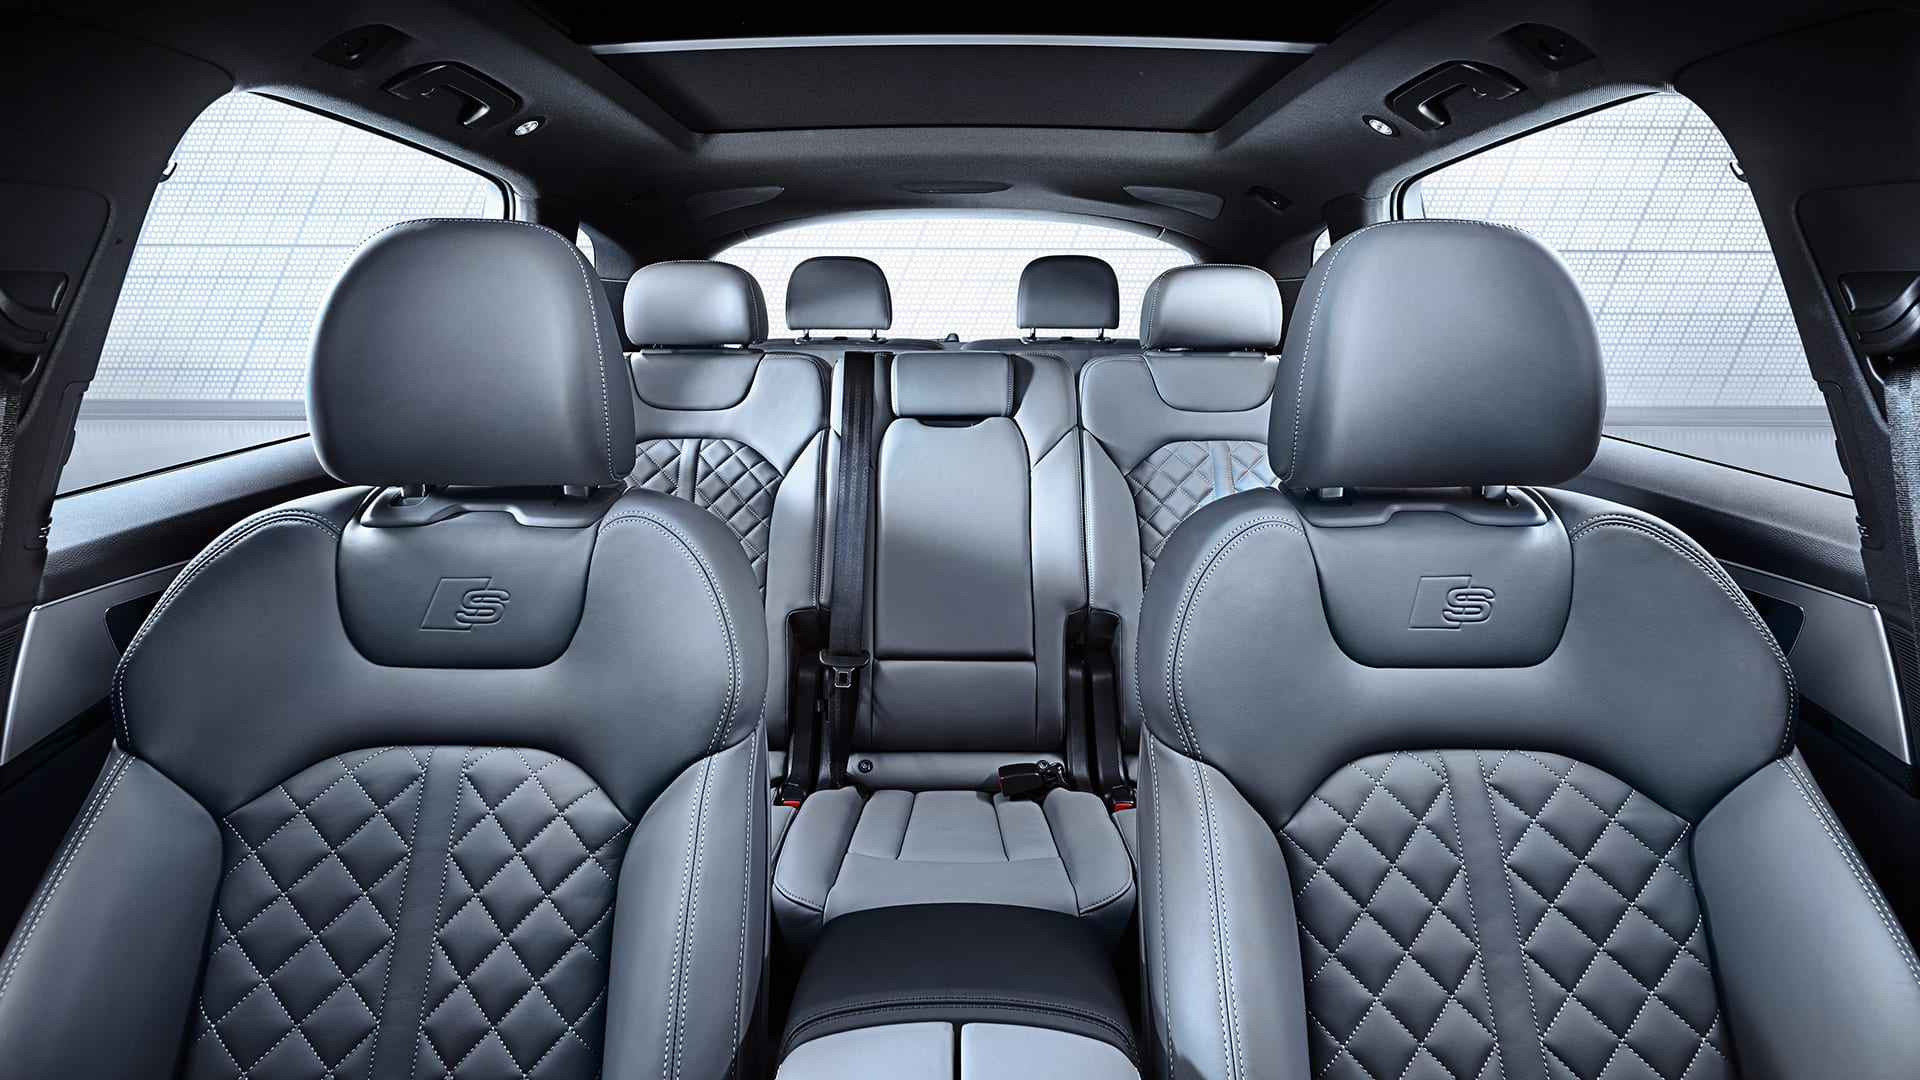 audi sq7 luxury 7 seater suv audi australia q7. Black Bedroom Furniture Sets. Home Design Ideas